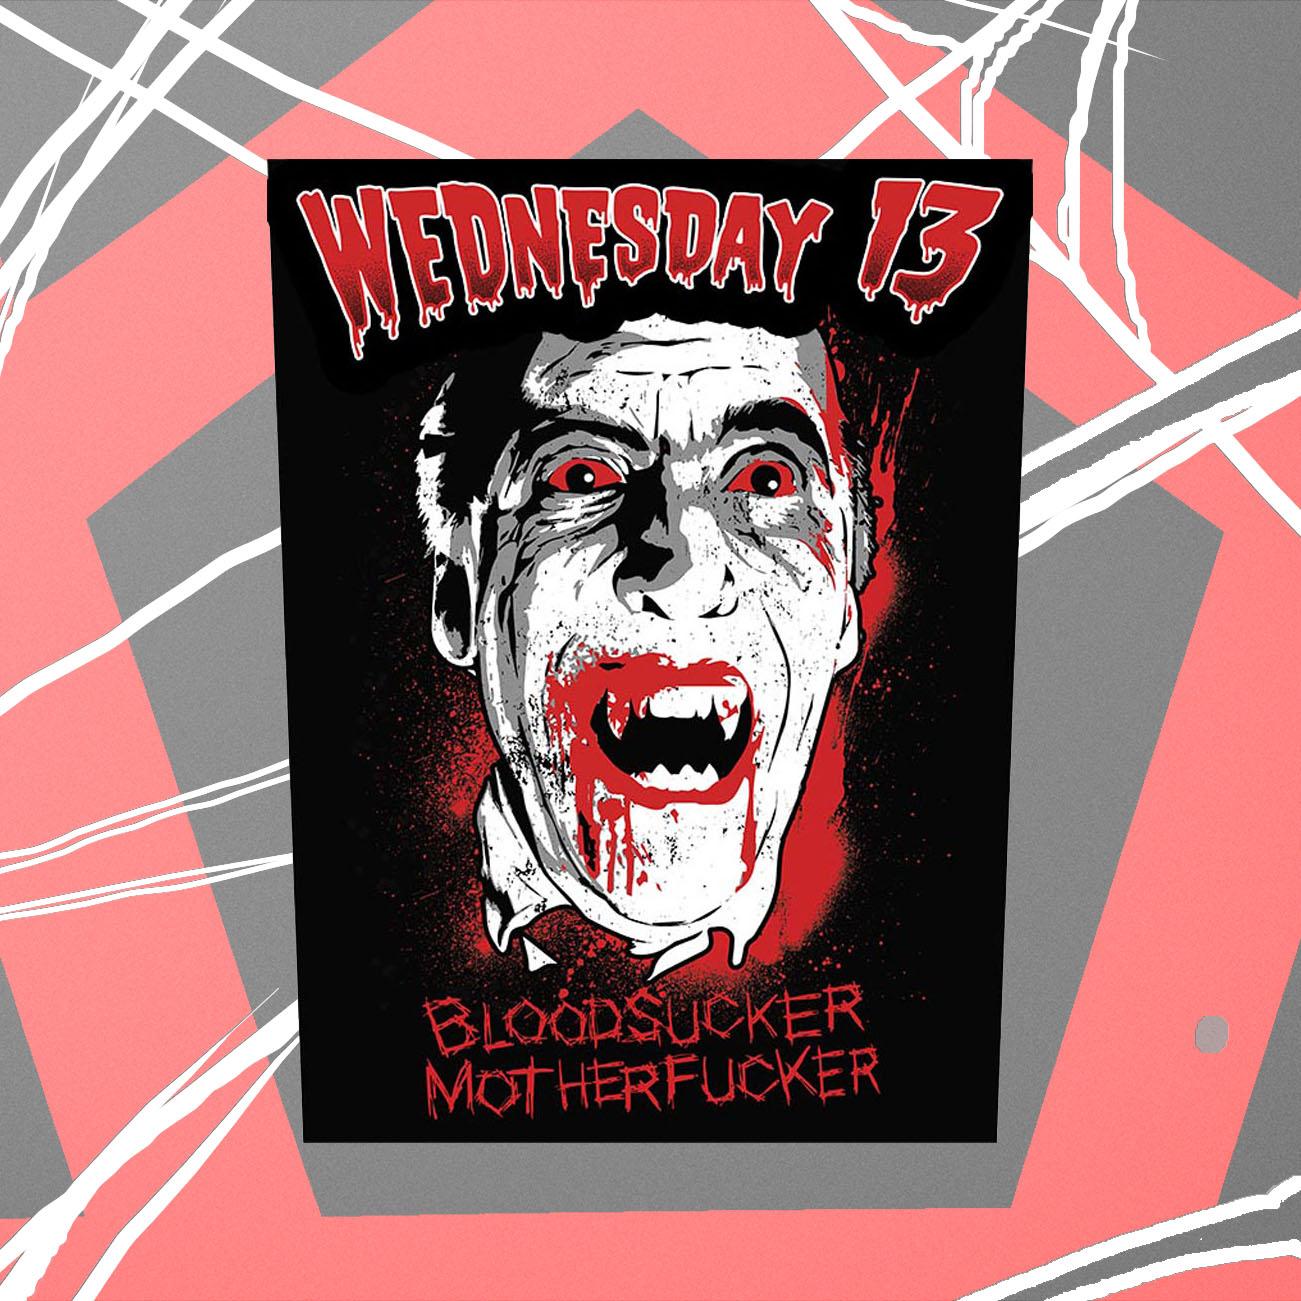 Wednesday 13 - 'Dracula' Back Patch - Wednesday13